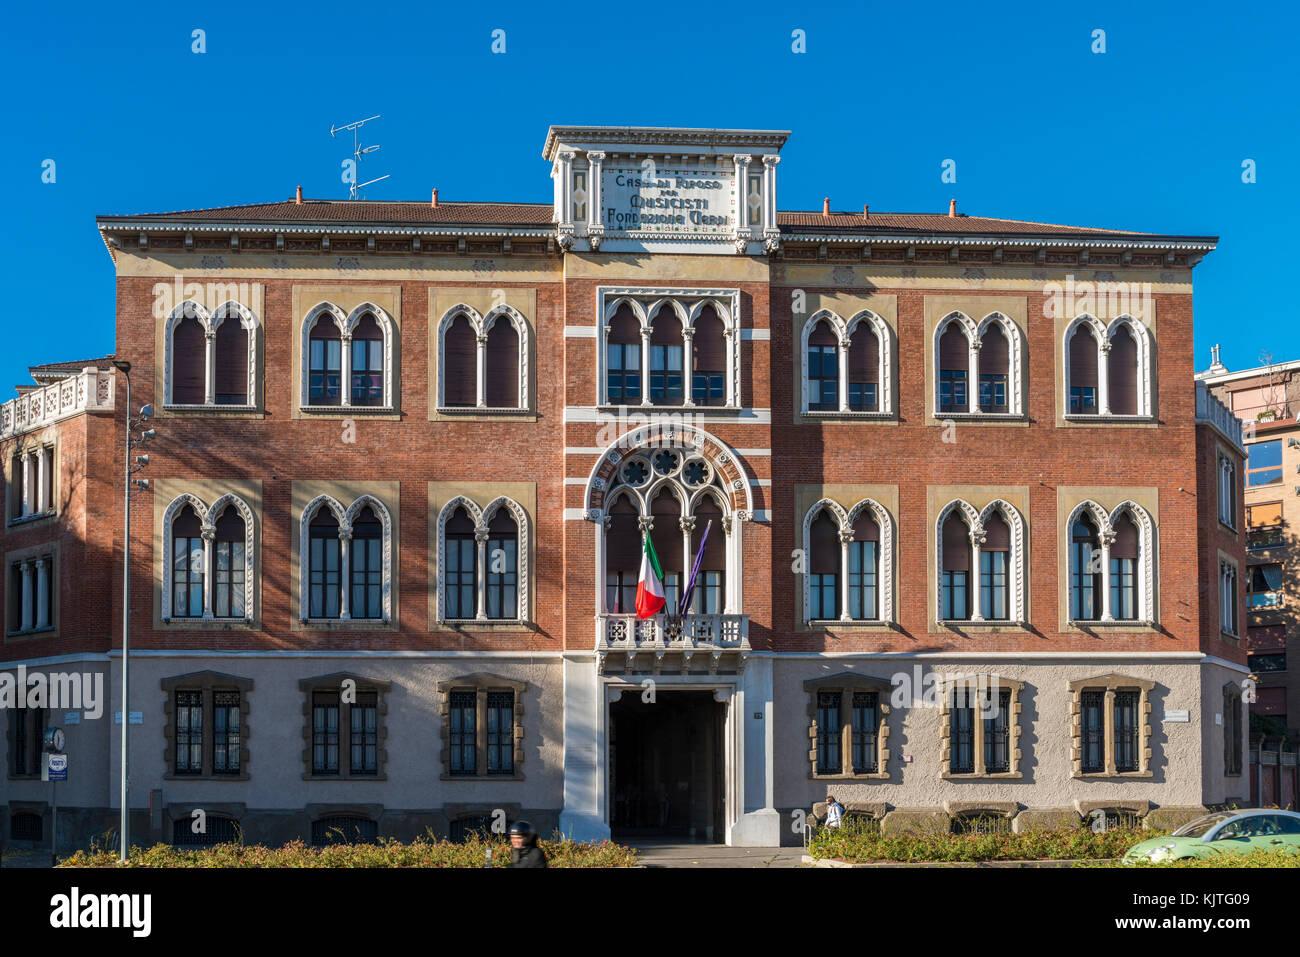 Italian opera house stock photos italian opera house for Casa di riposo milano